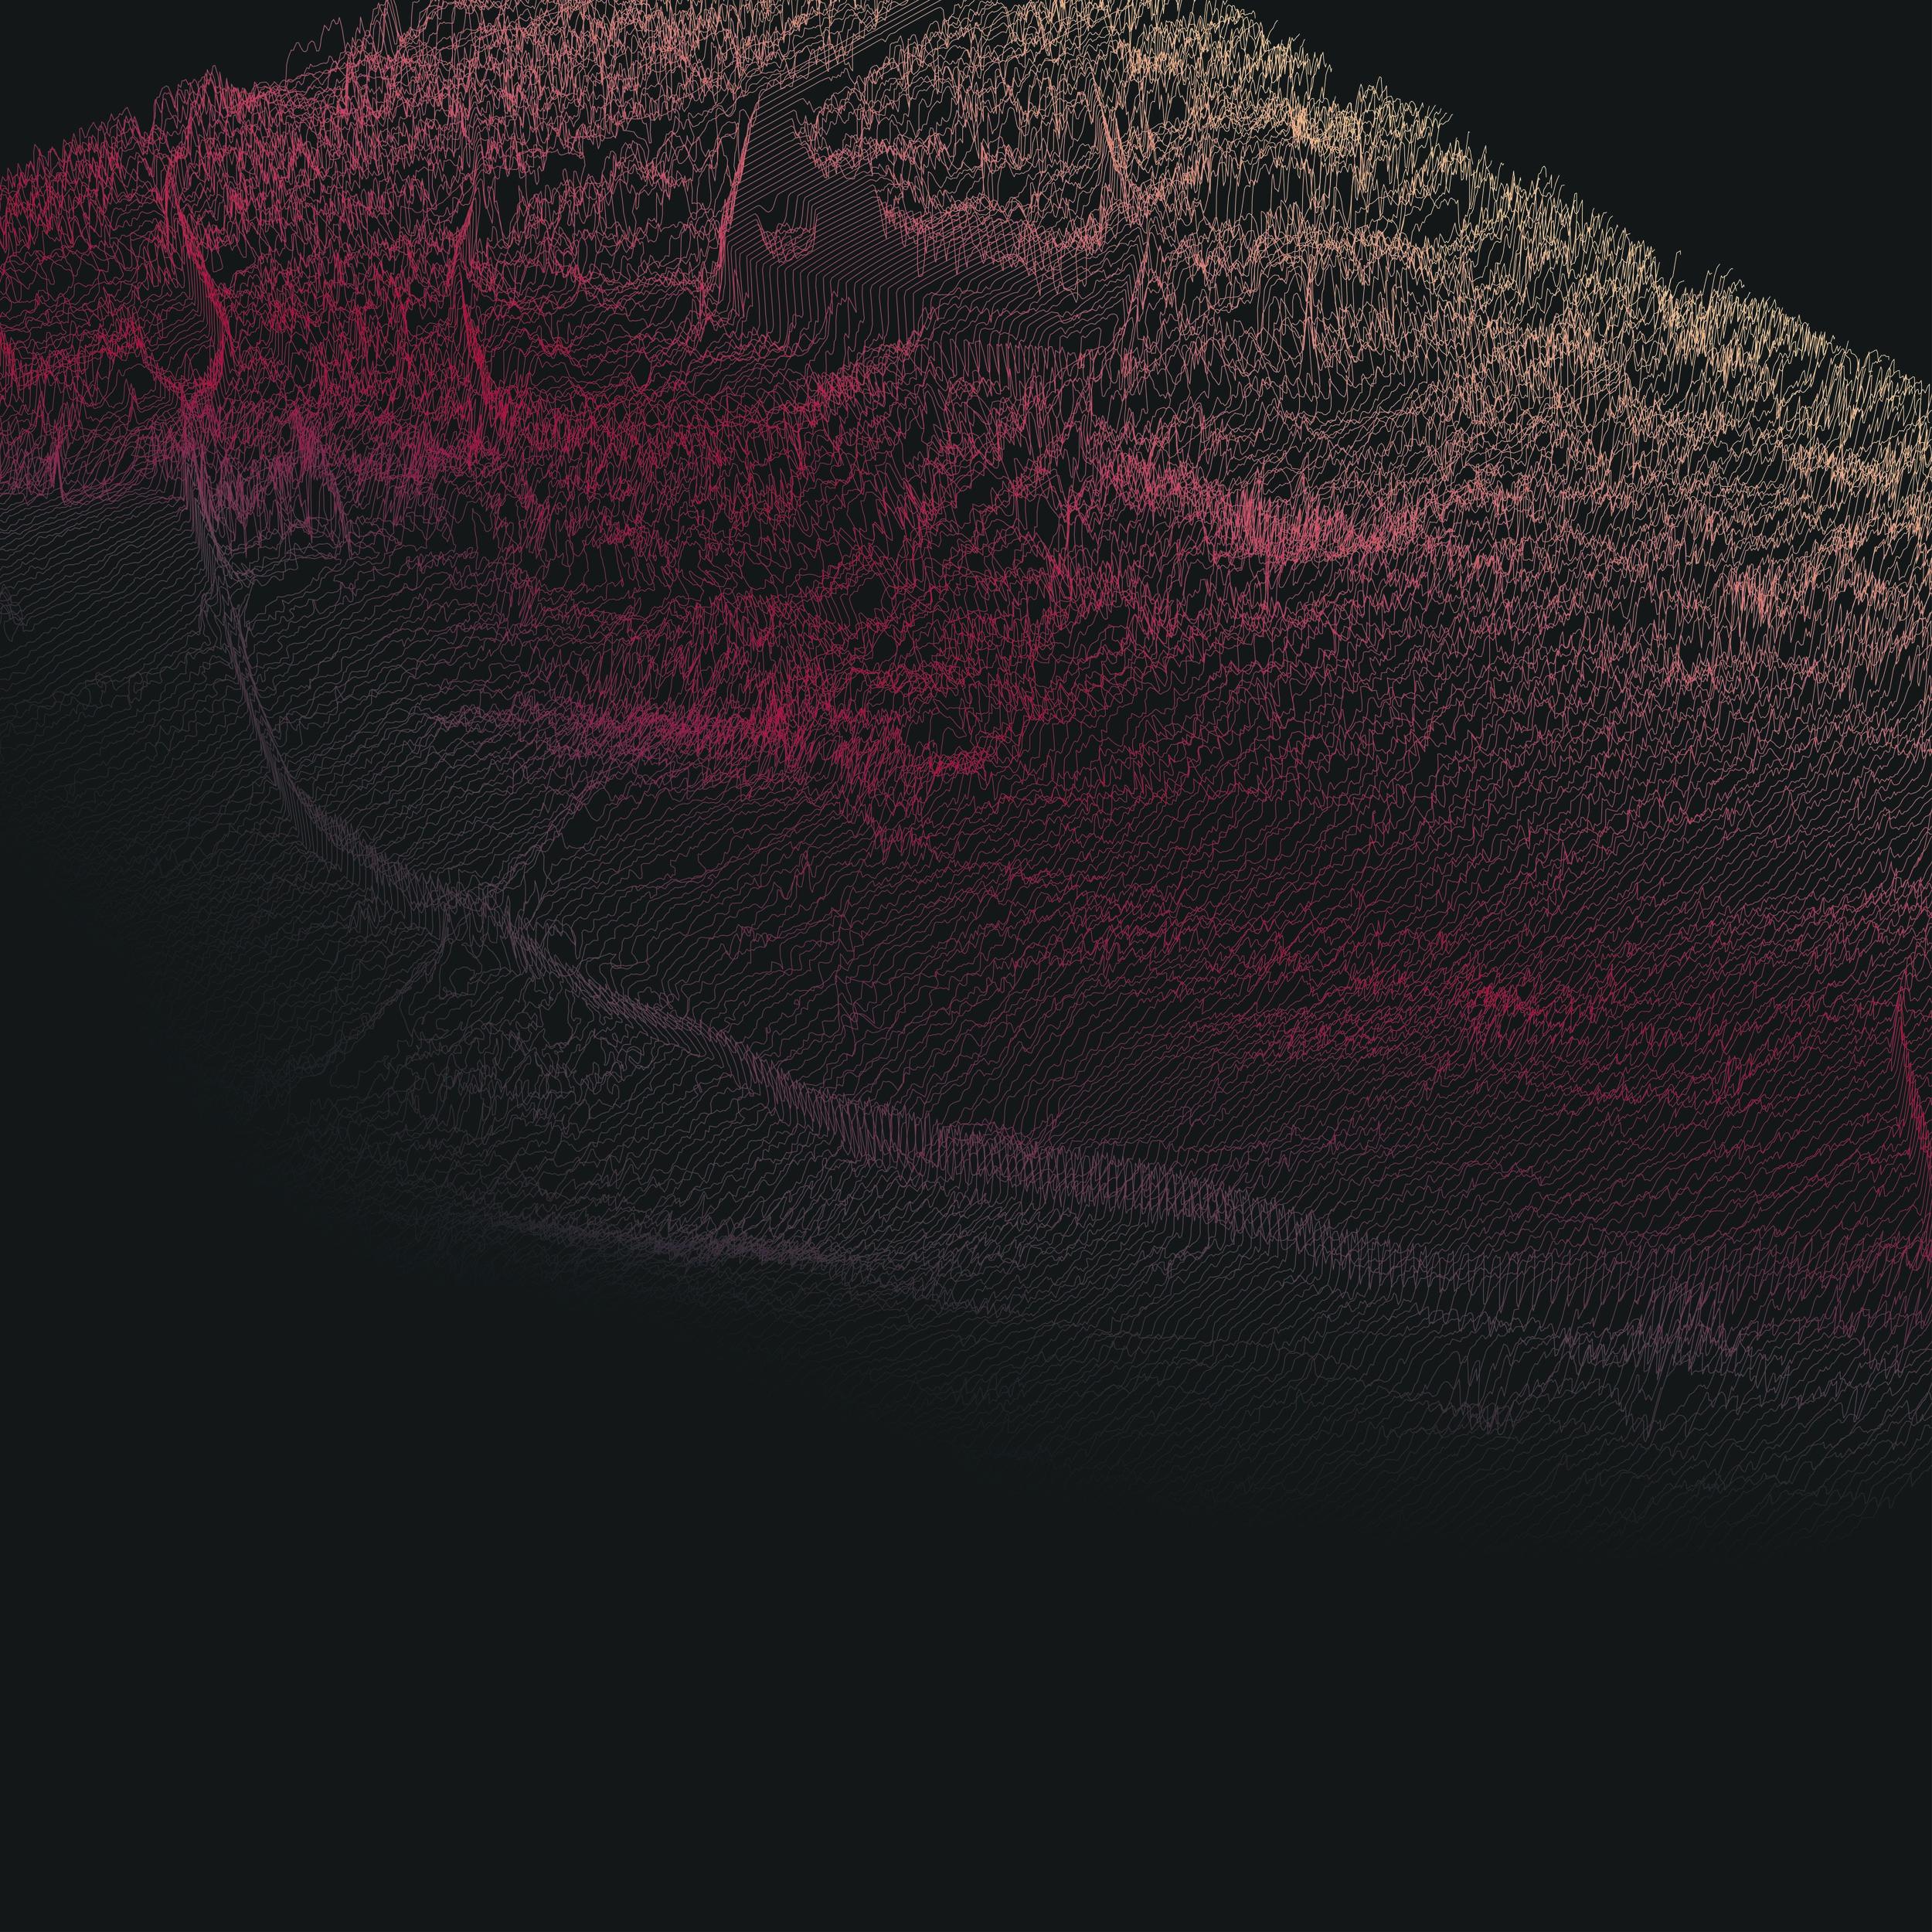 Mapping Polarization